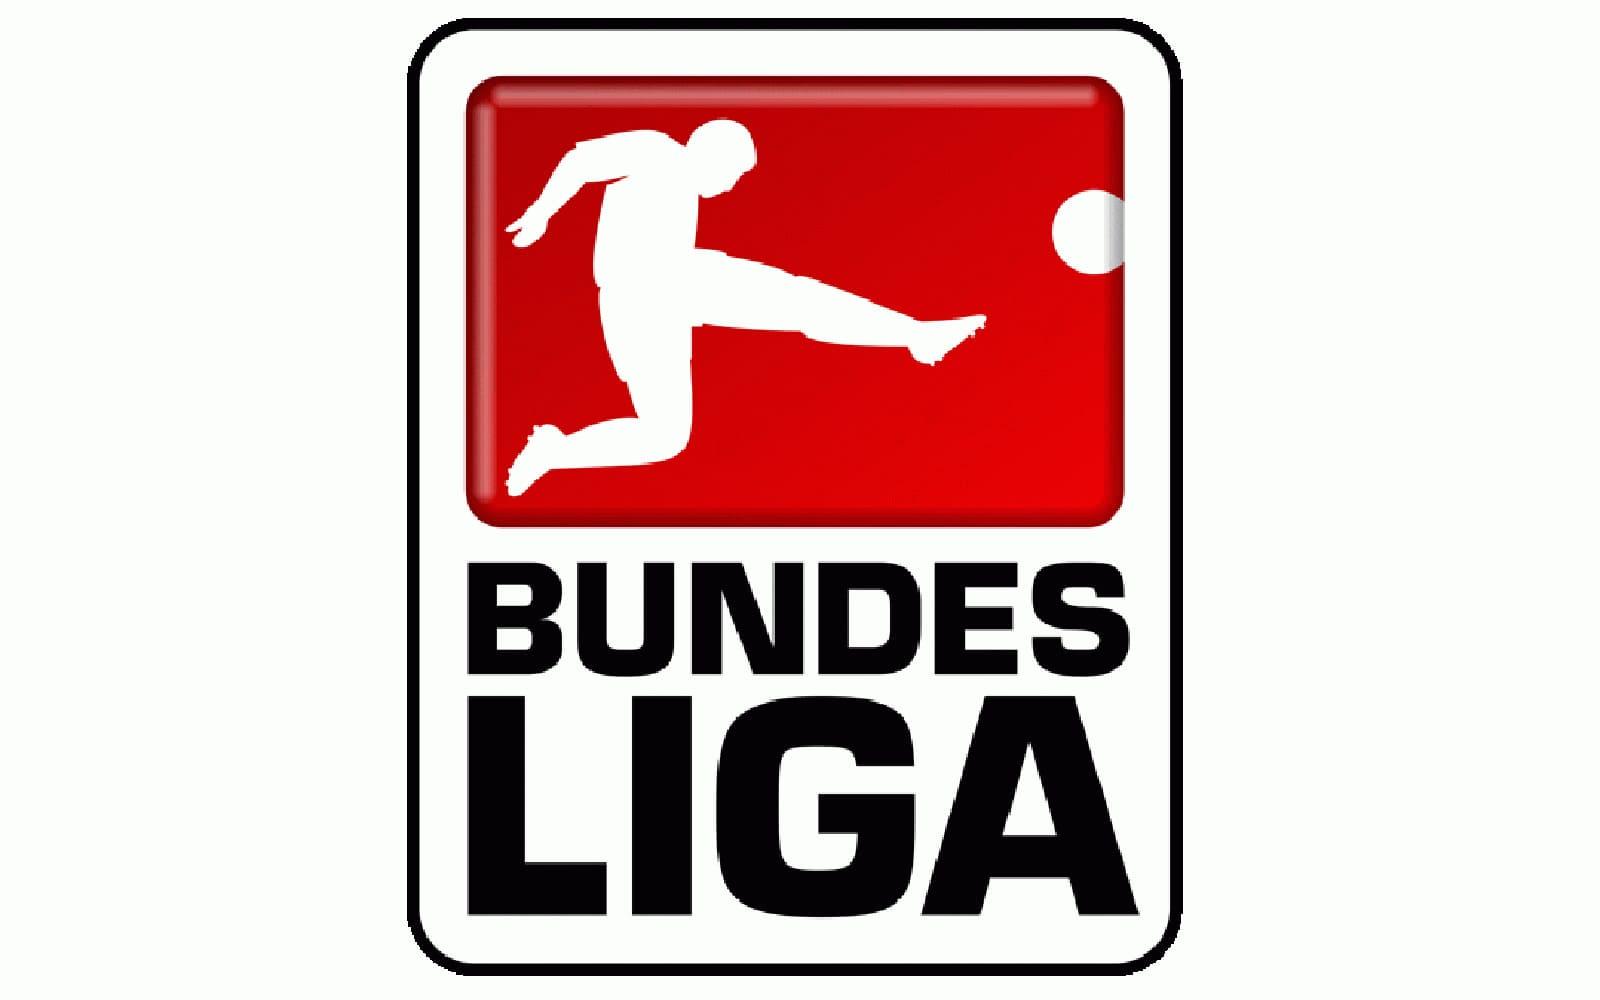 bundesliga logo and symbol meaning history png bundesliga logo and symbol meaning